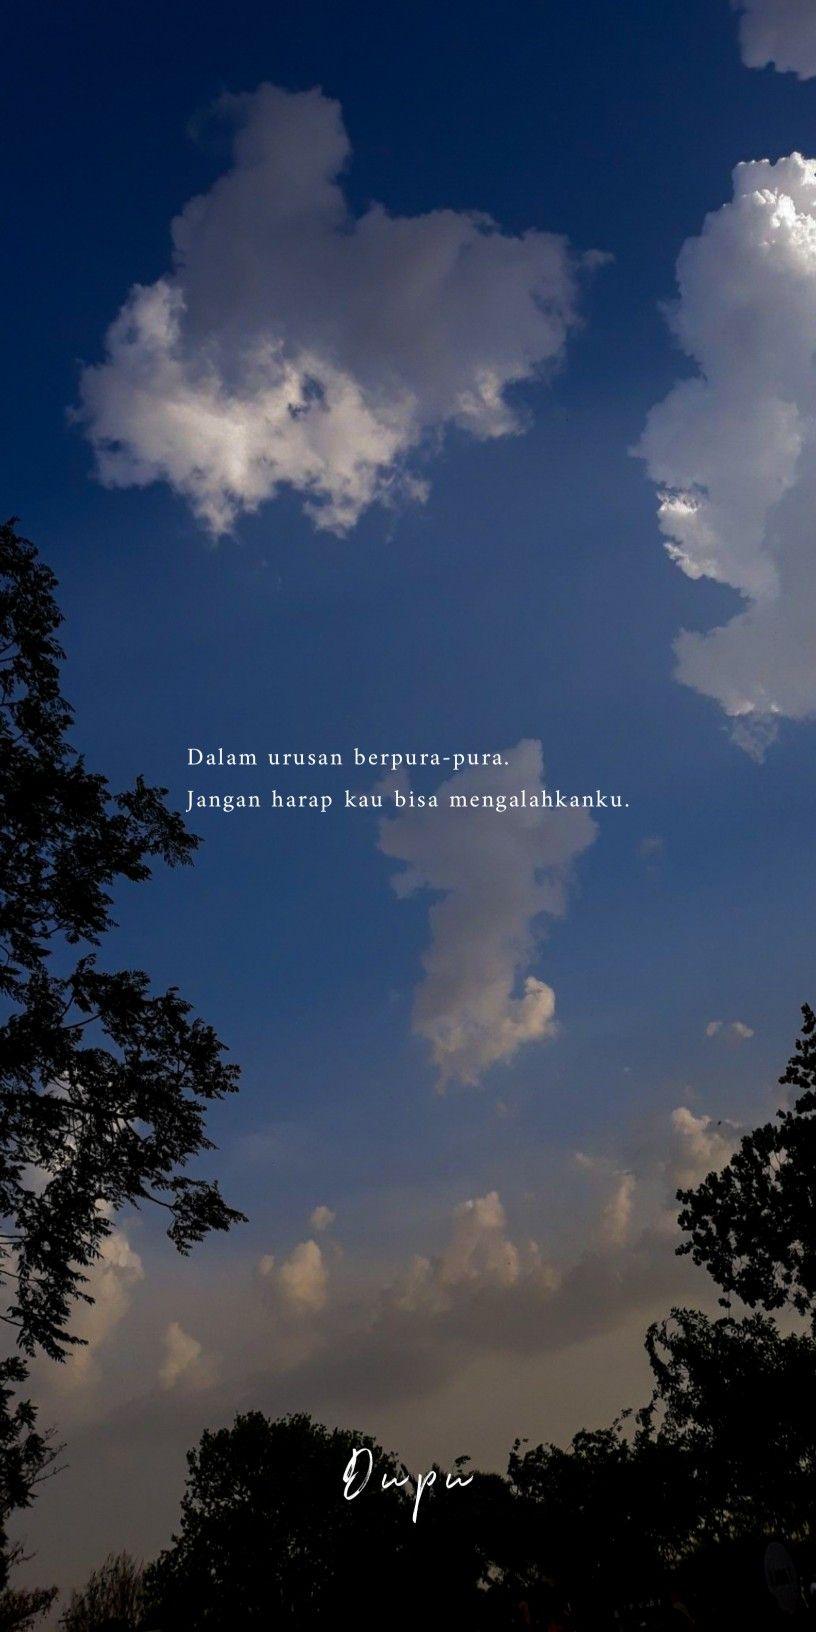 Bad Liar Artinya Indonesia : artinya, indonesia, Kata-kata, Indah,, Kutipan, Hidup,, Remaja